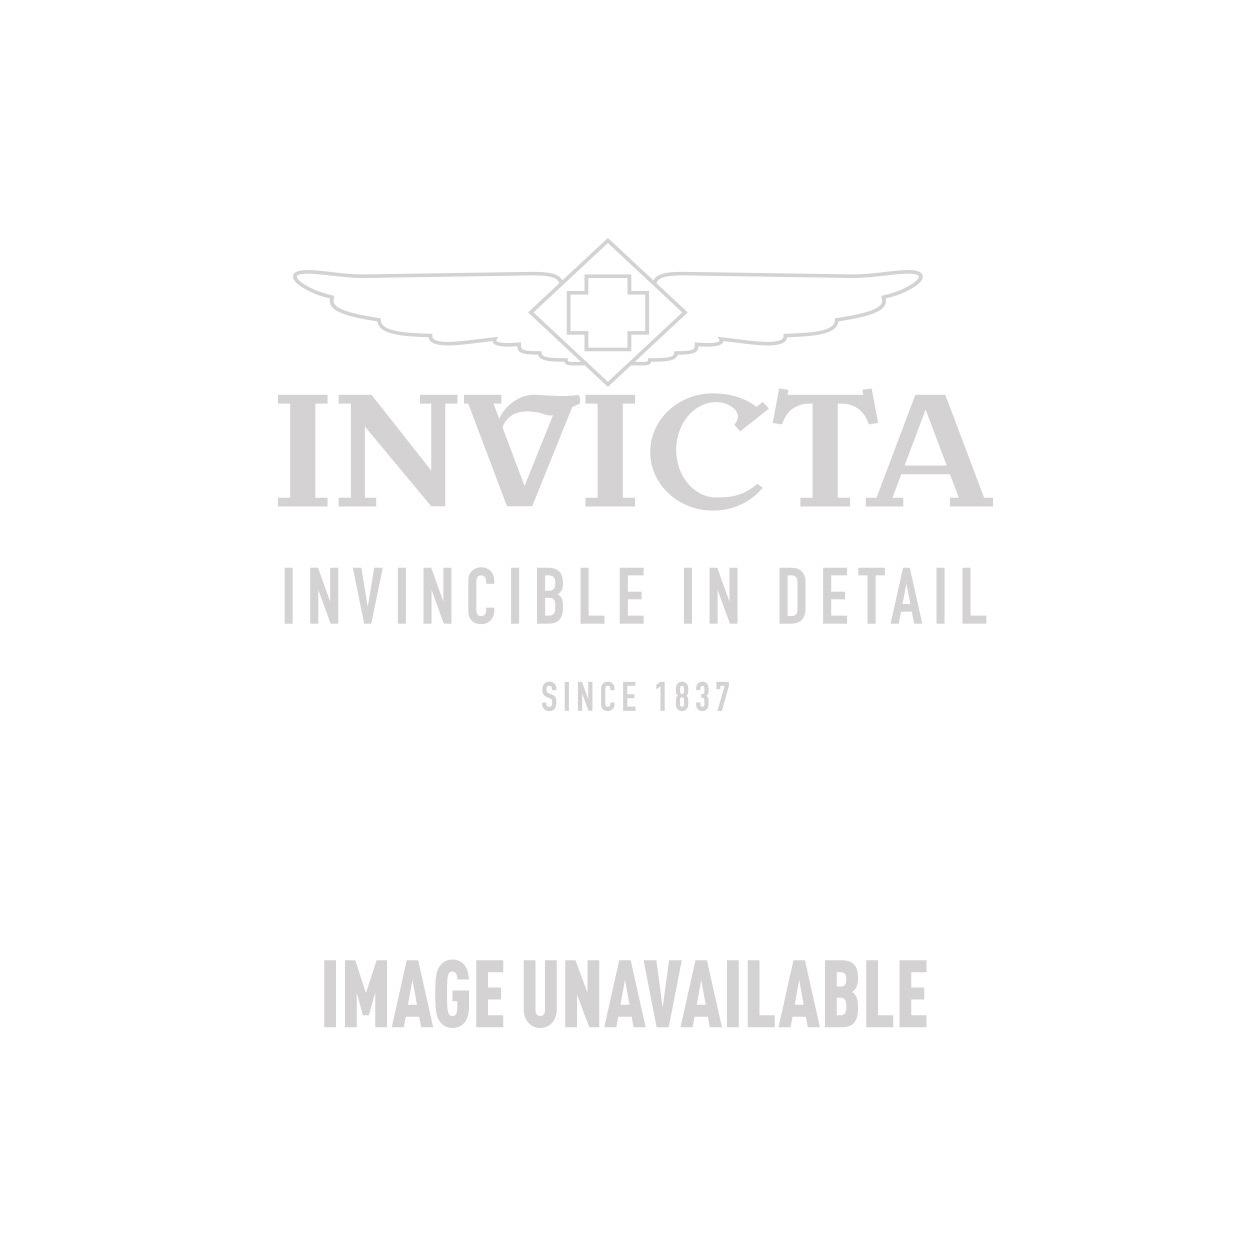 Invicta Lupah Swiss Made Quartz Watch - Black case with Red tone Polyurethane band - Model 6728